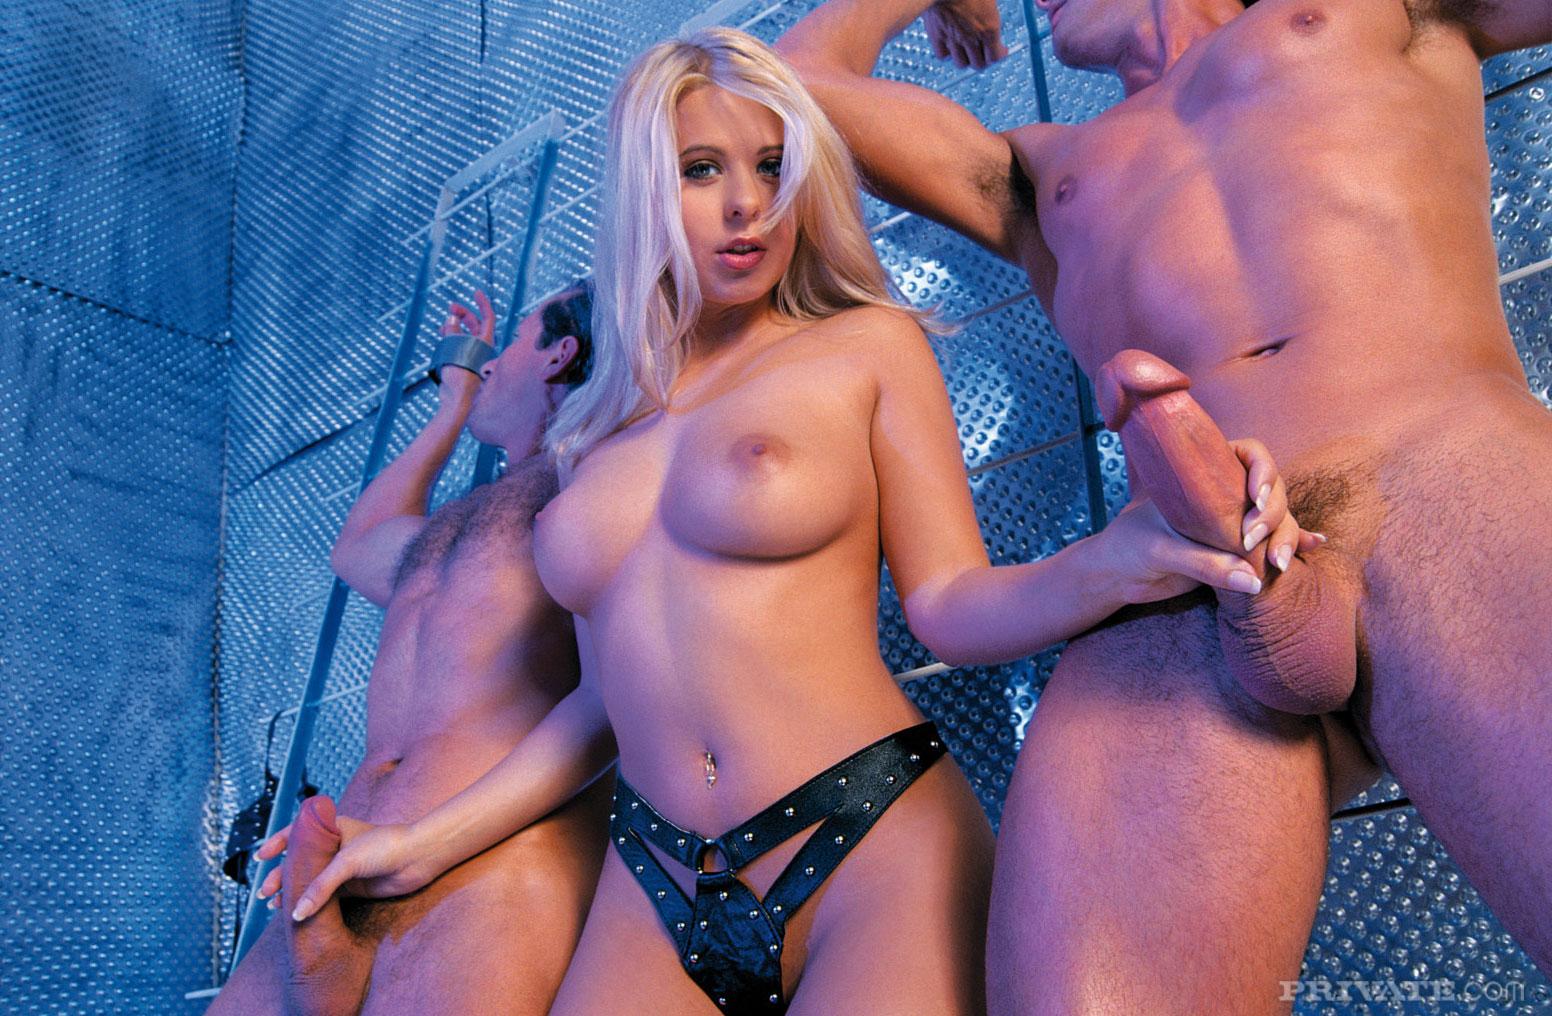 Порно с приват моделями